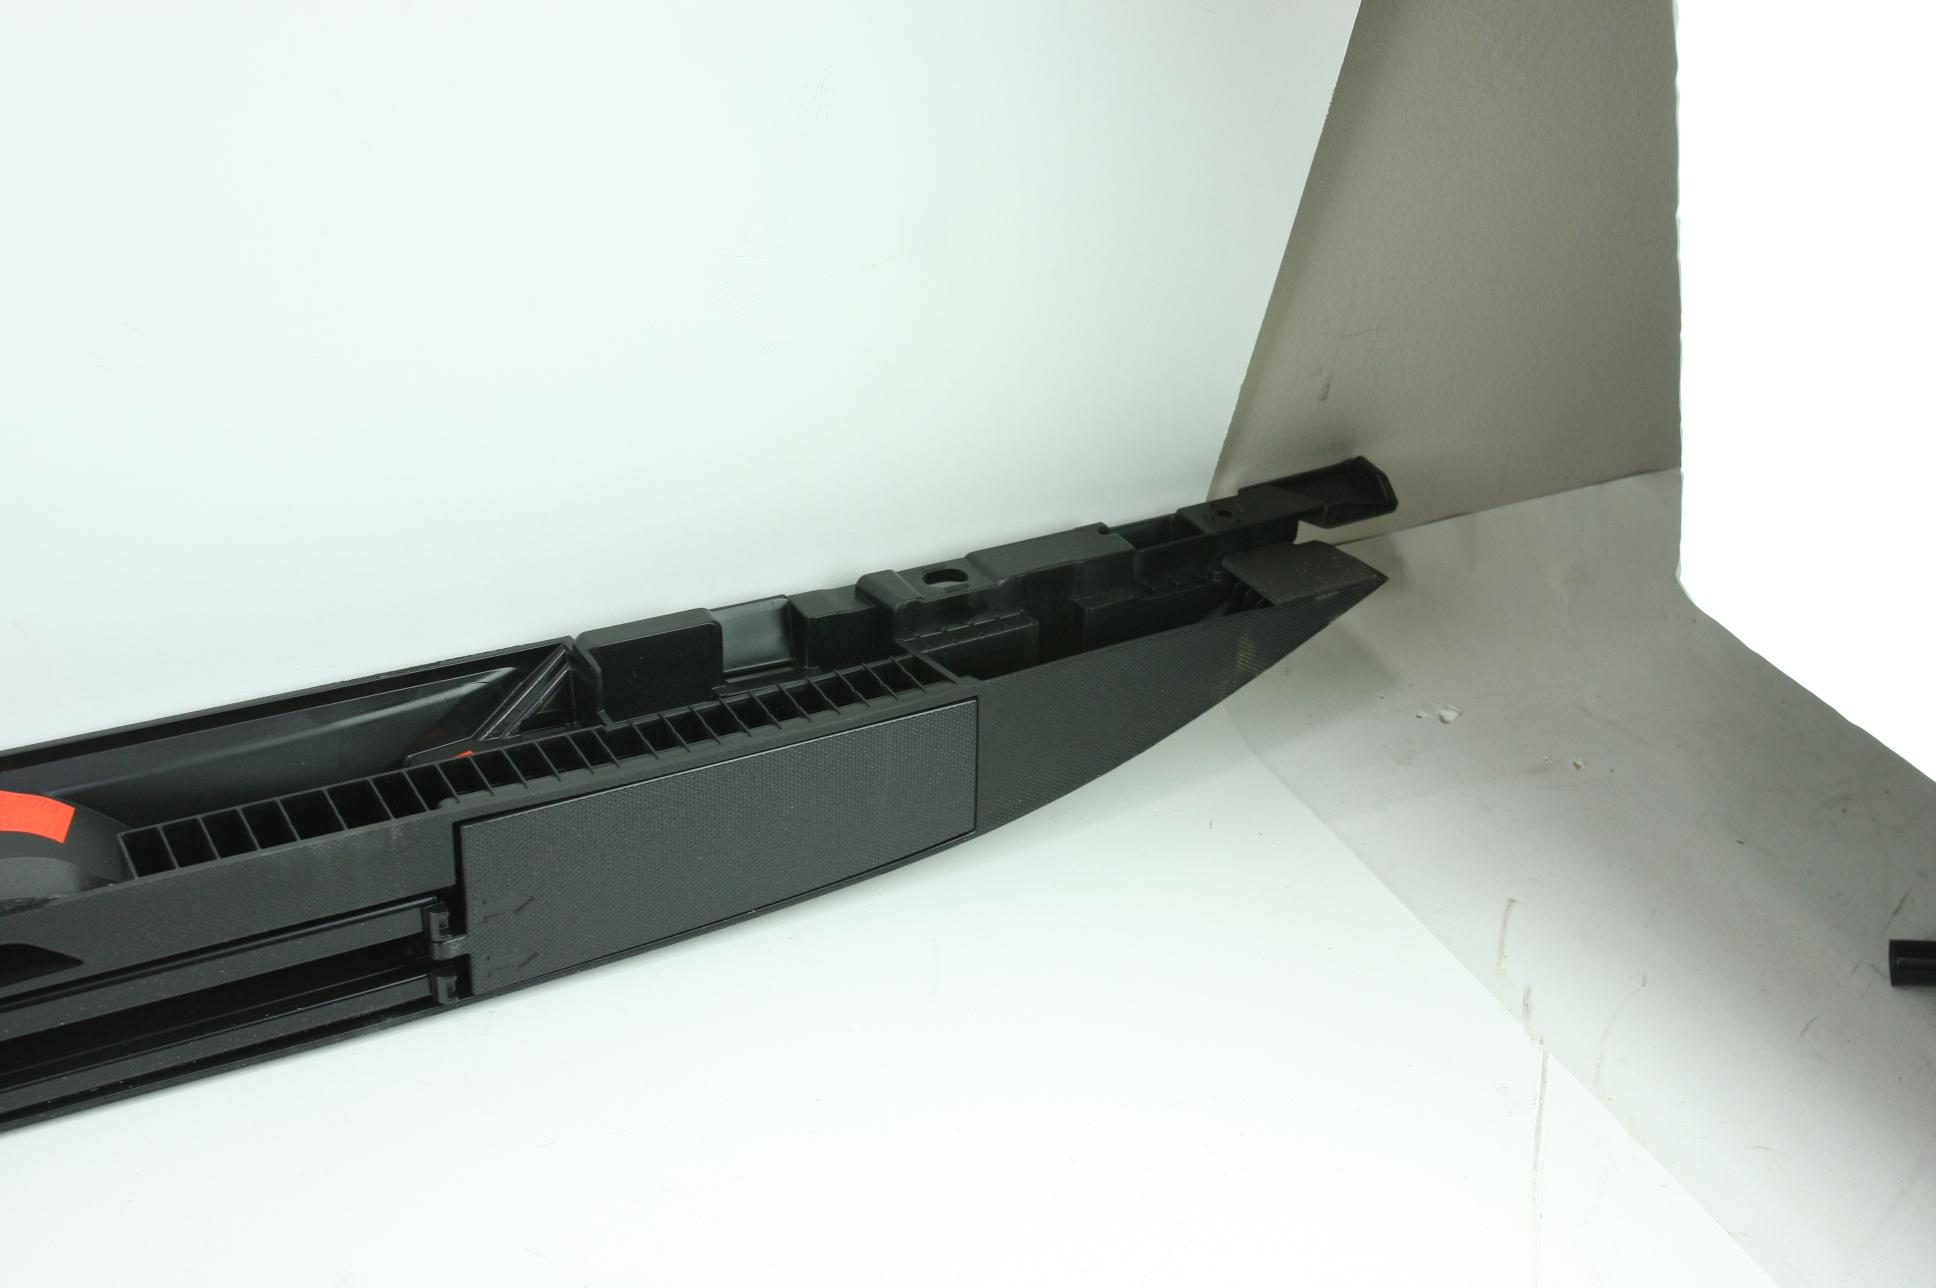 *** New Genuine OEM 23324213 GM Roof Rack Luggage Carrier Side Rail LH 84016250 - image 10